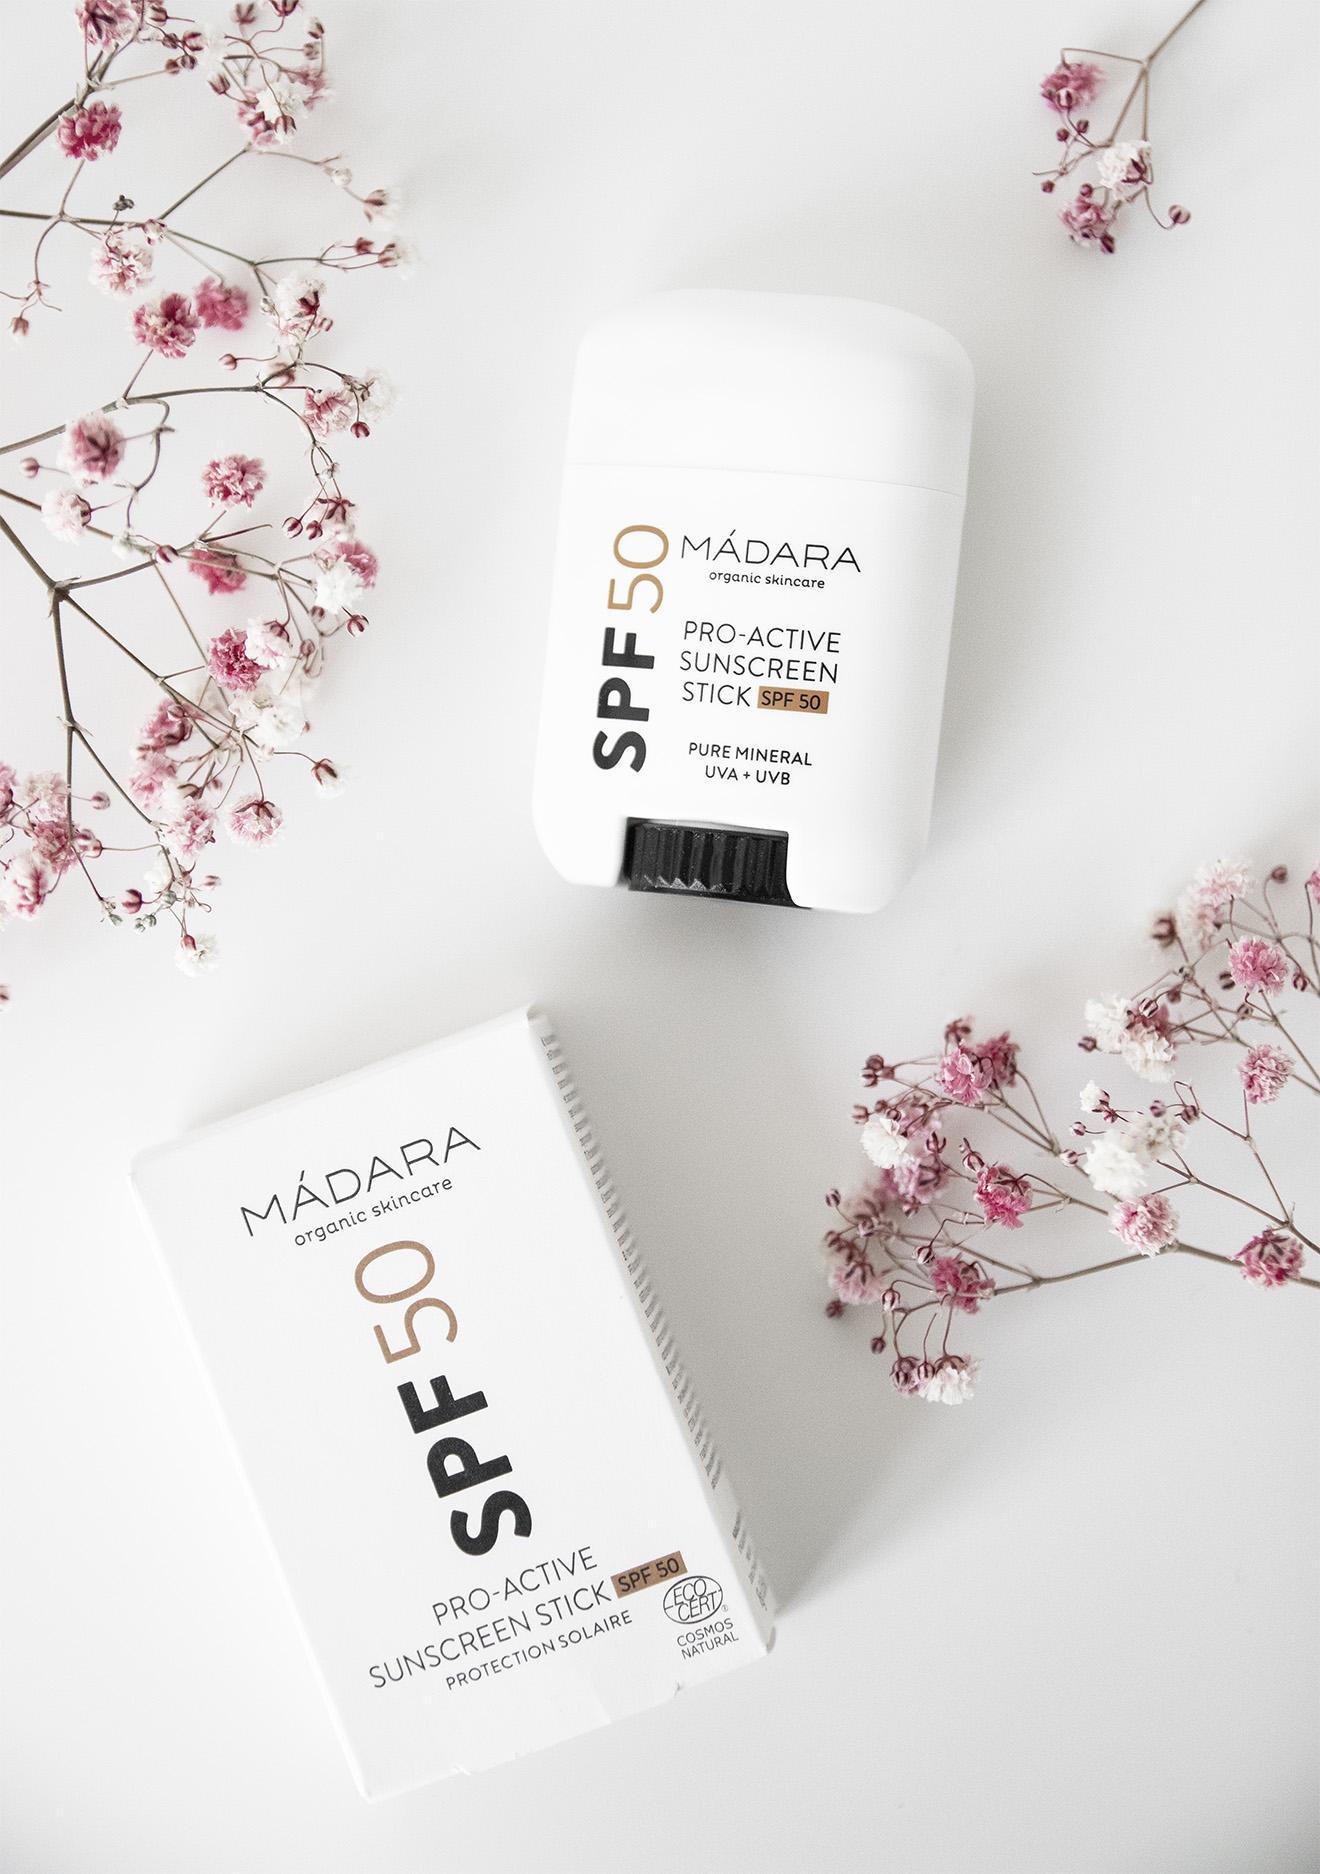 Madara SPF50 Pro-Active Sunscreen Stick